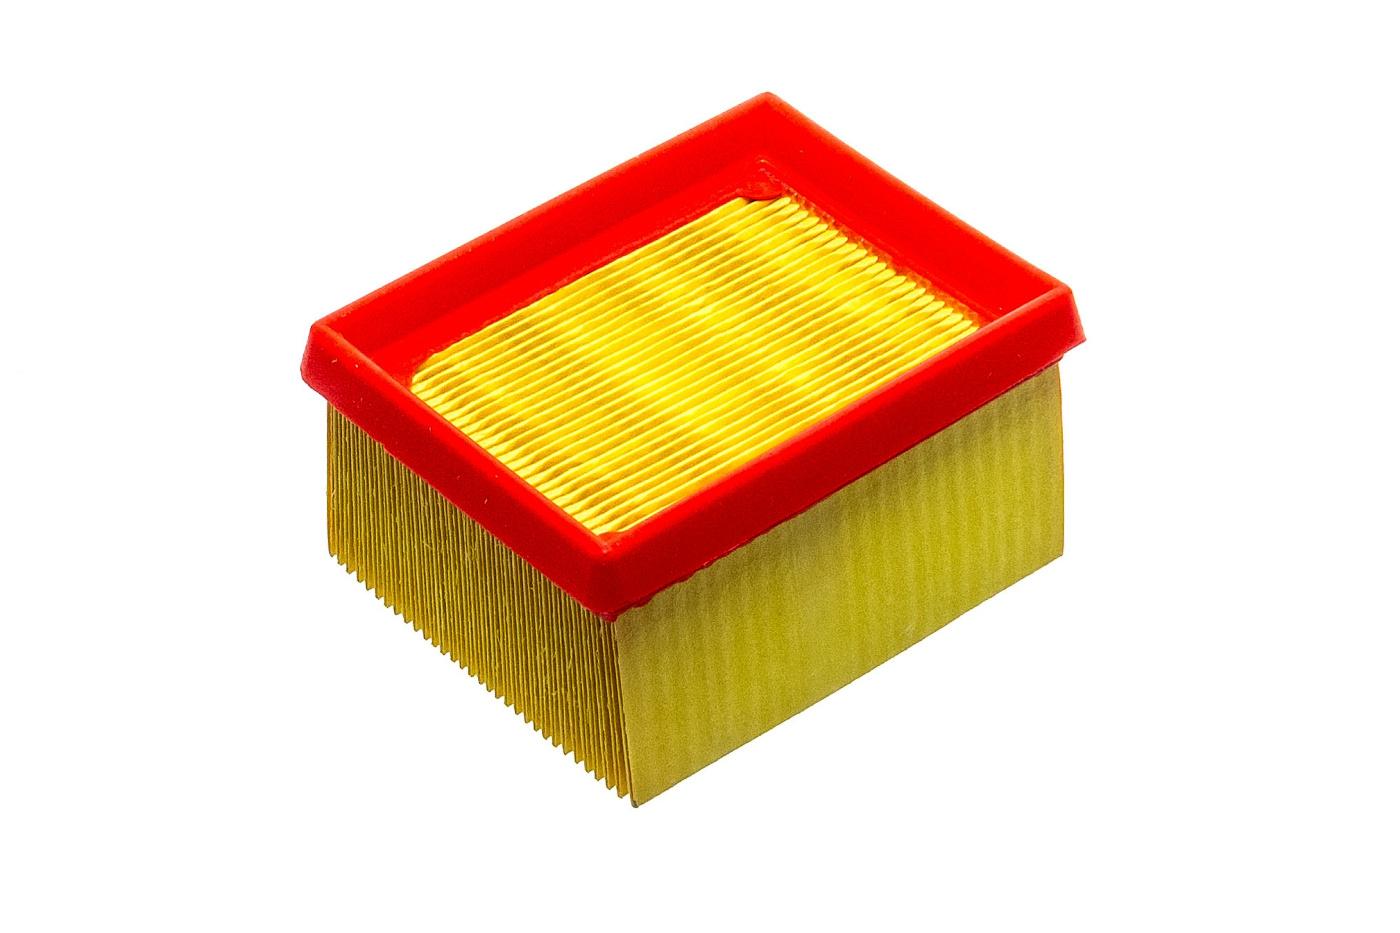 Vzduchový filter WACKER 0108076 MAKITA - 394 173 010 EVEREST